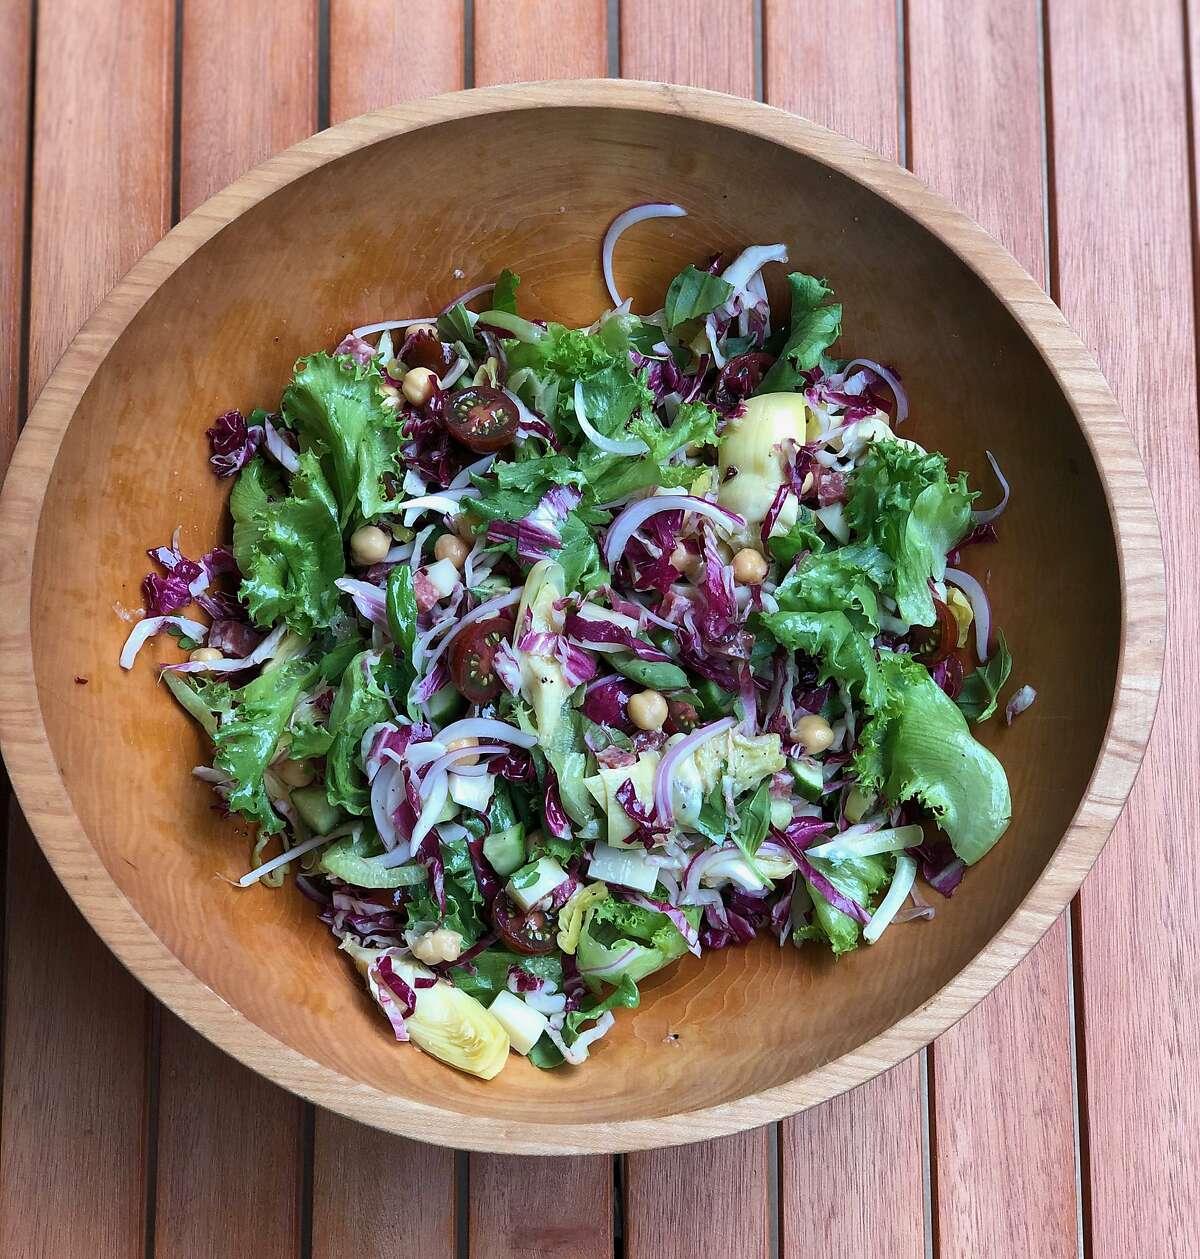 The Chop-Chop Salad.